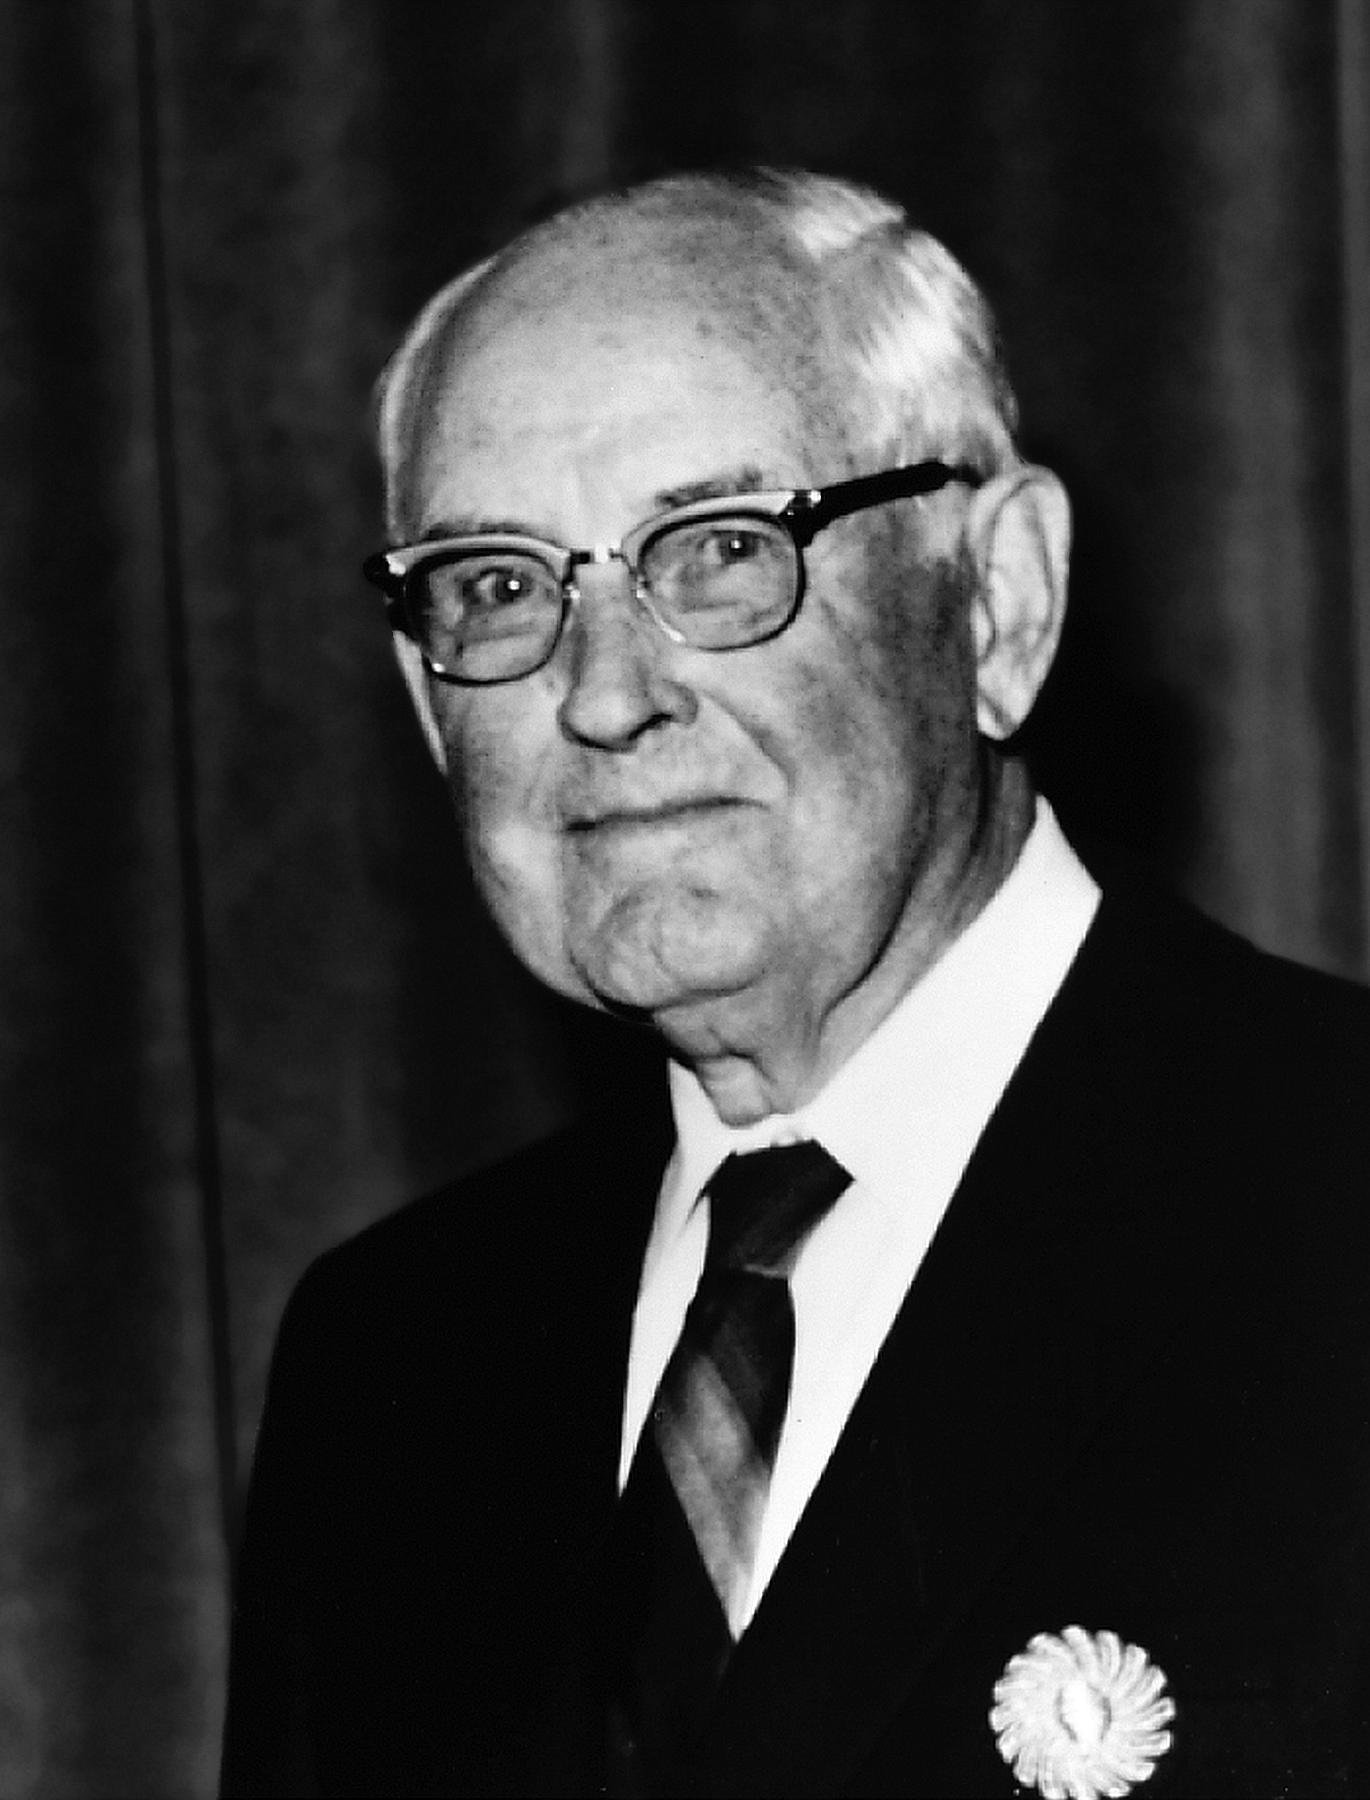 James Edgar Broyhill